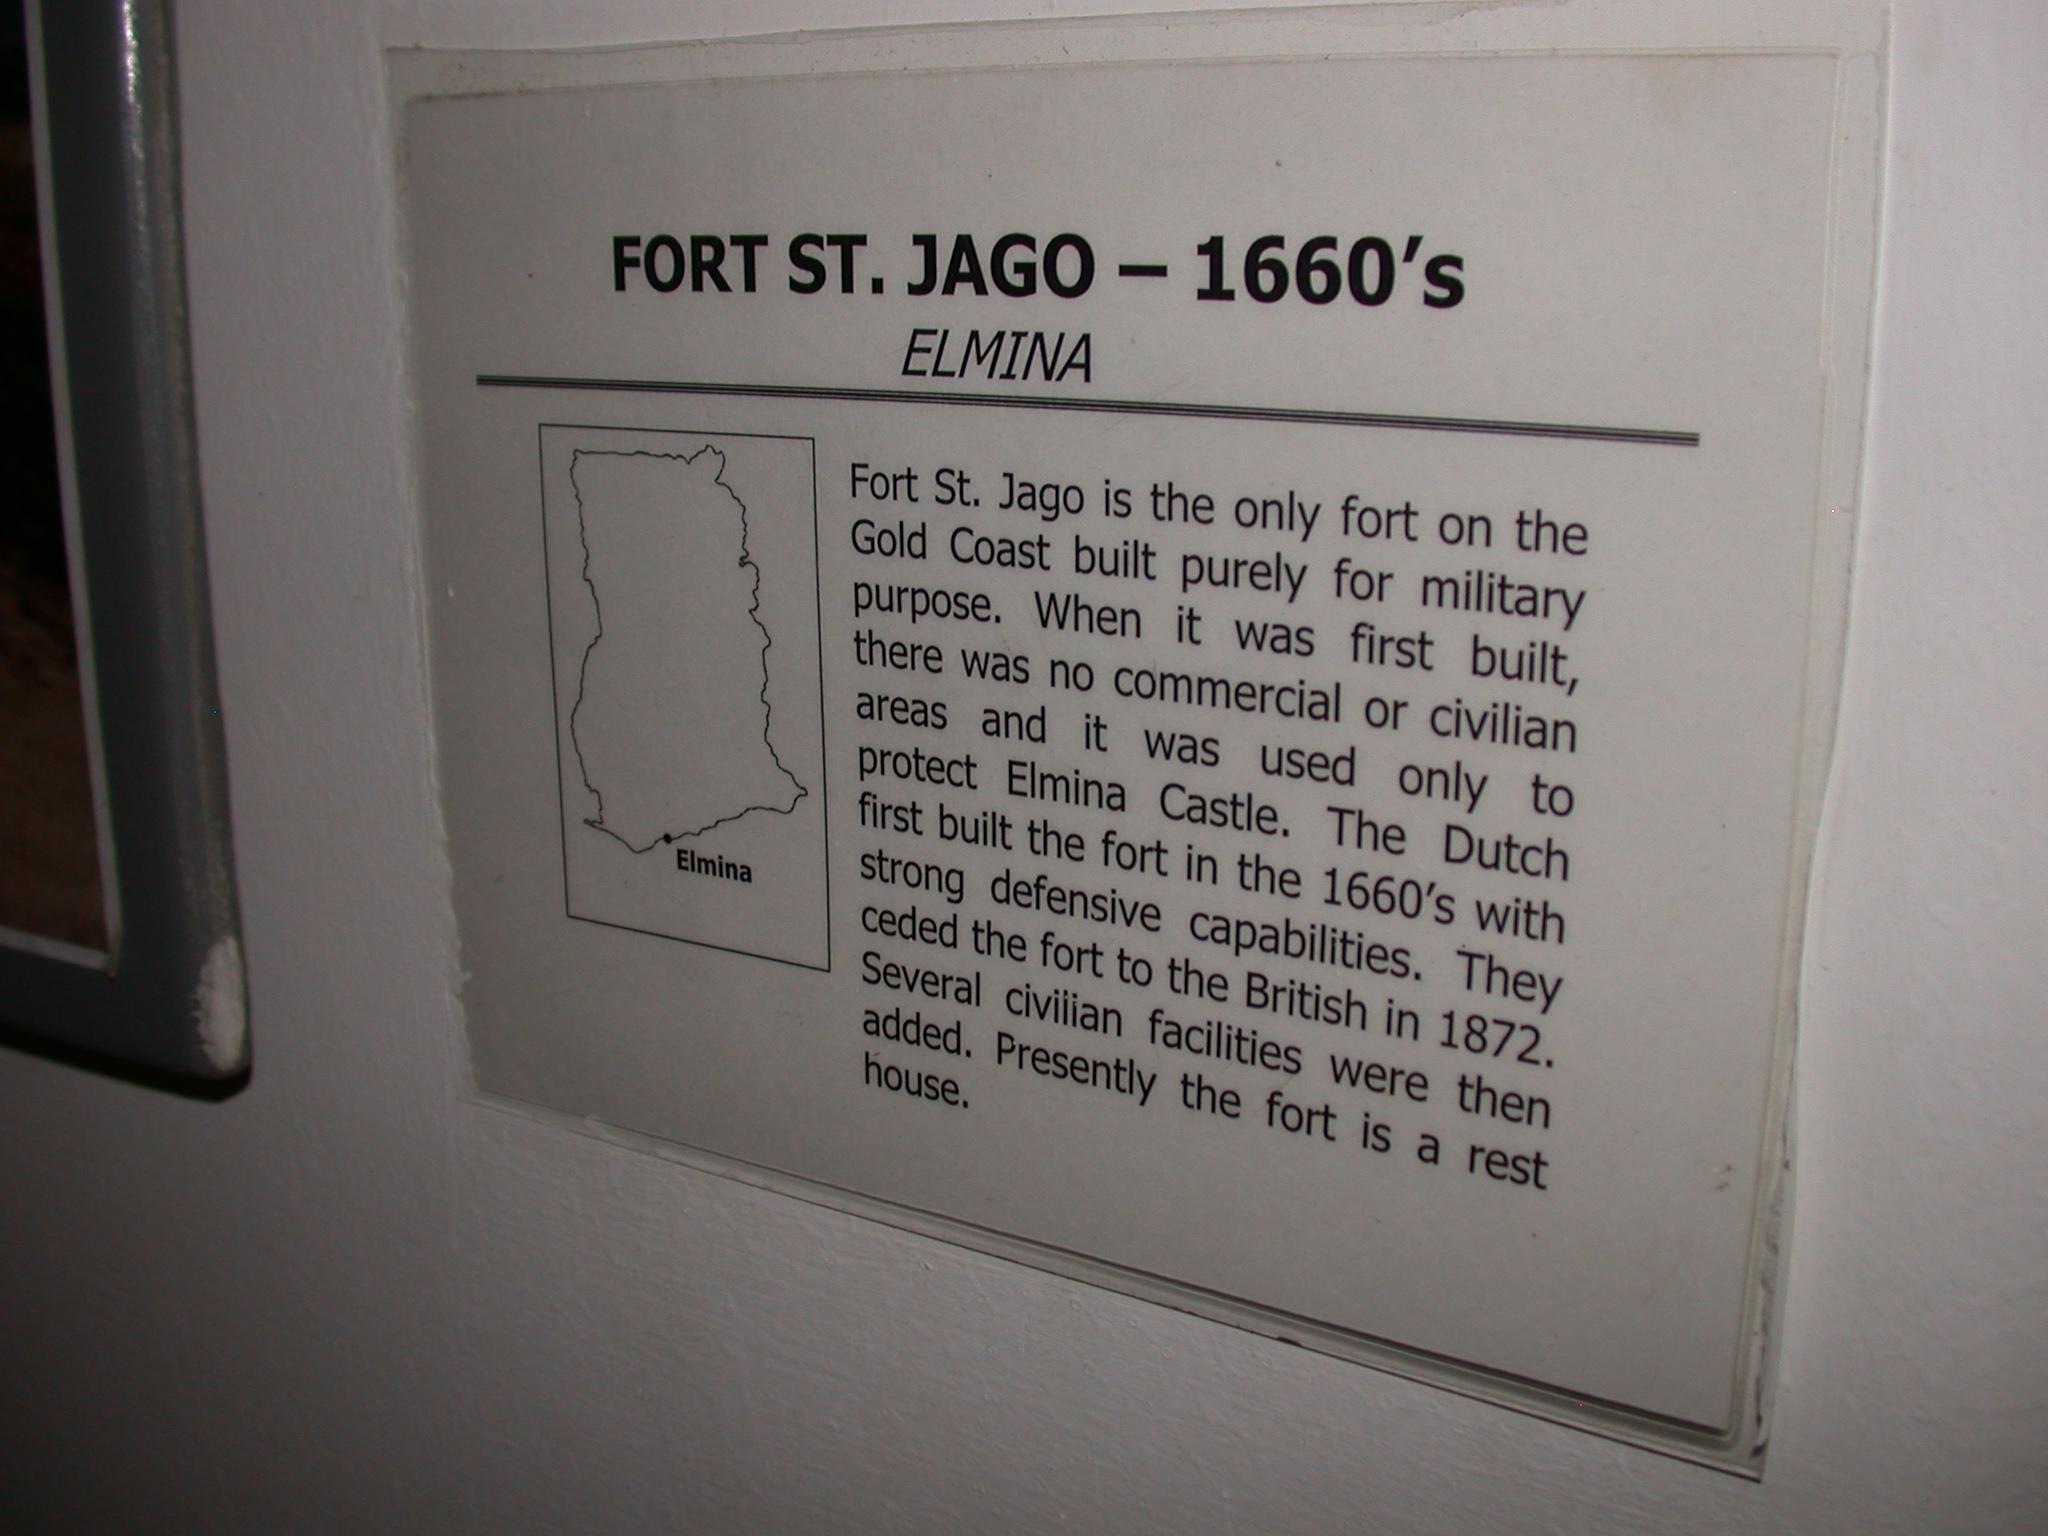 Description of Fort St. Jago in Elmina, National Museum, Accra, Ghana